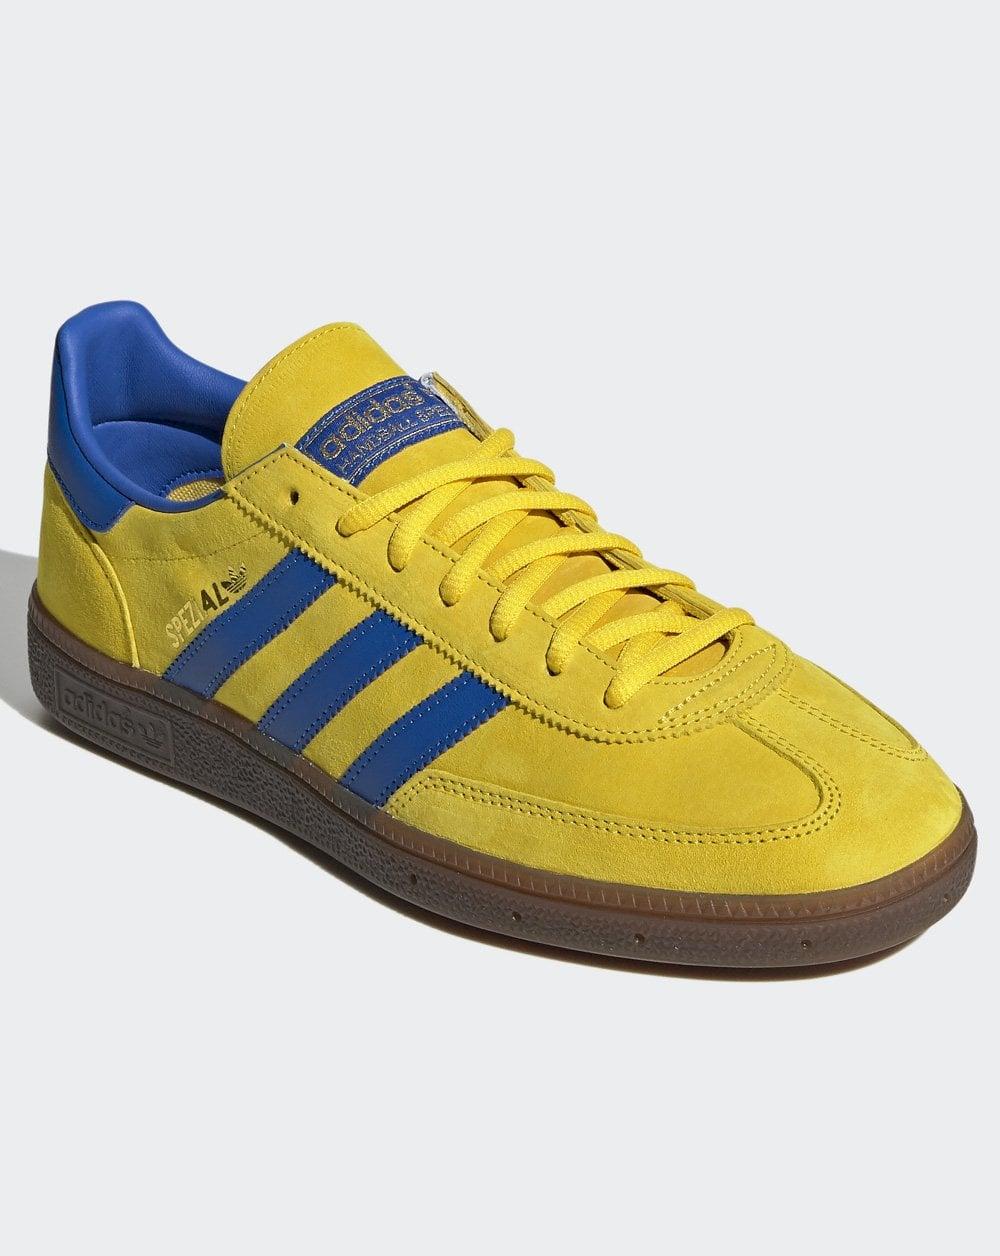 Adidas Handball Spezial Trainers Yellow/Blue